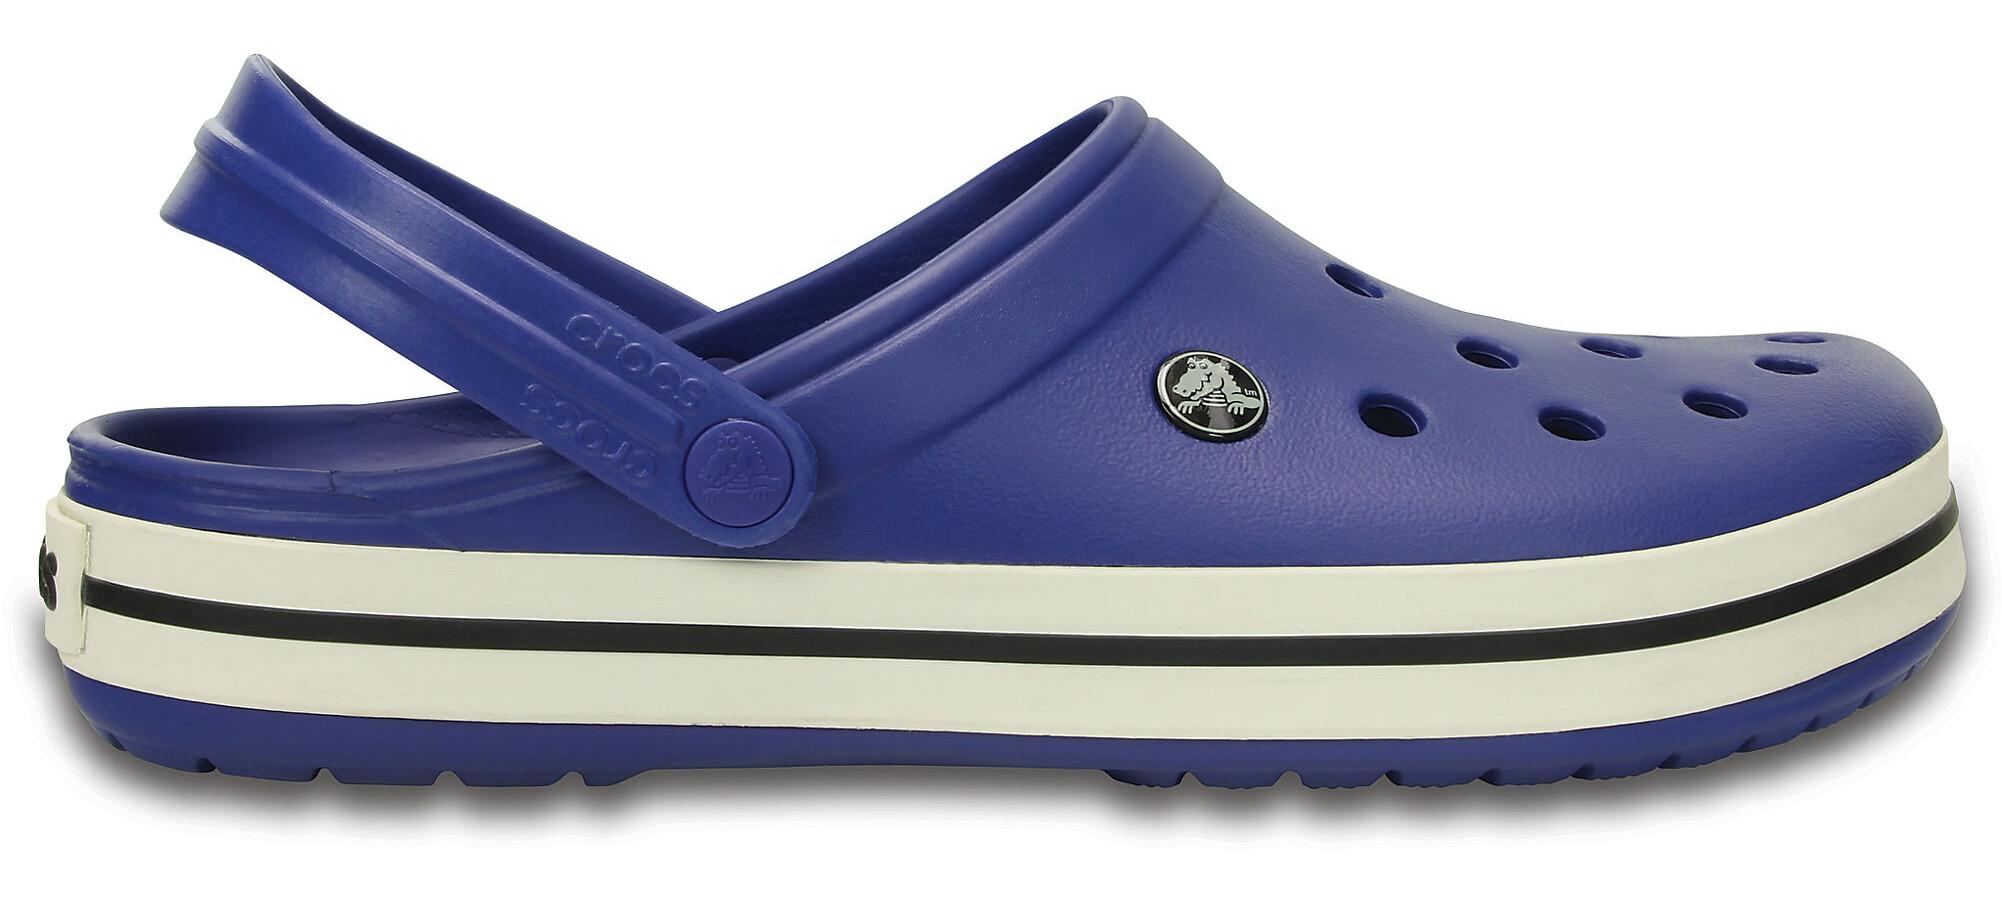 3a773228b Crocs Crocband Clogs Unisex cerulean blue oyster